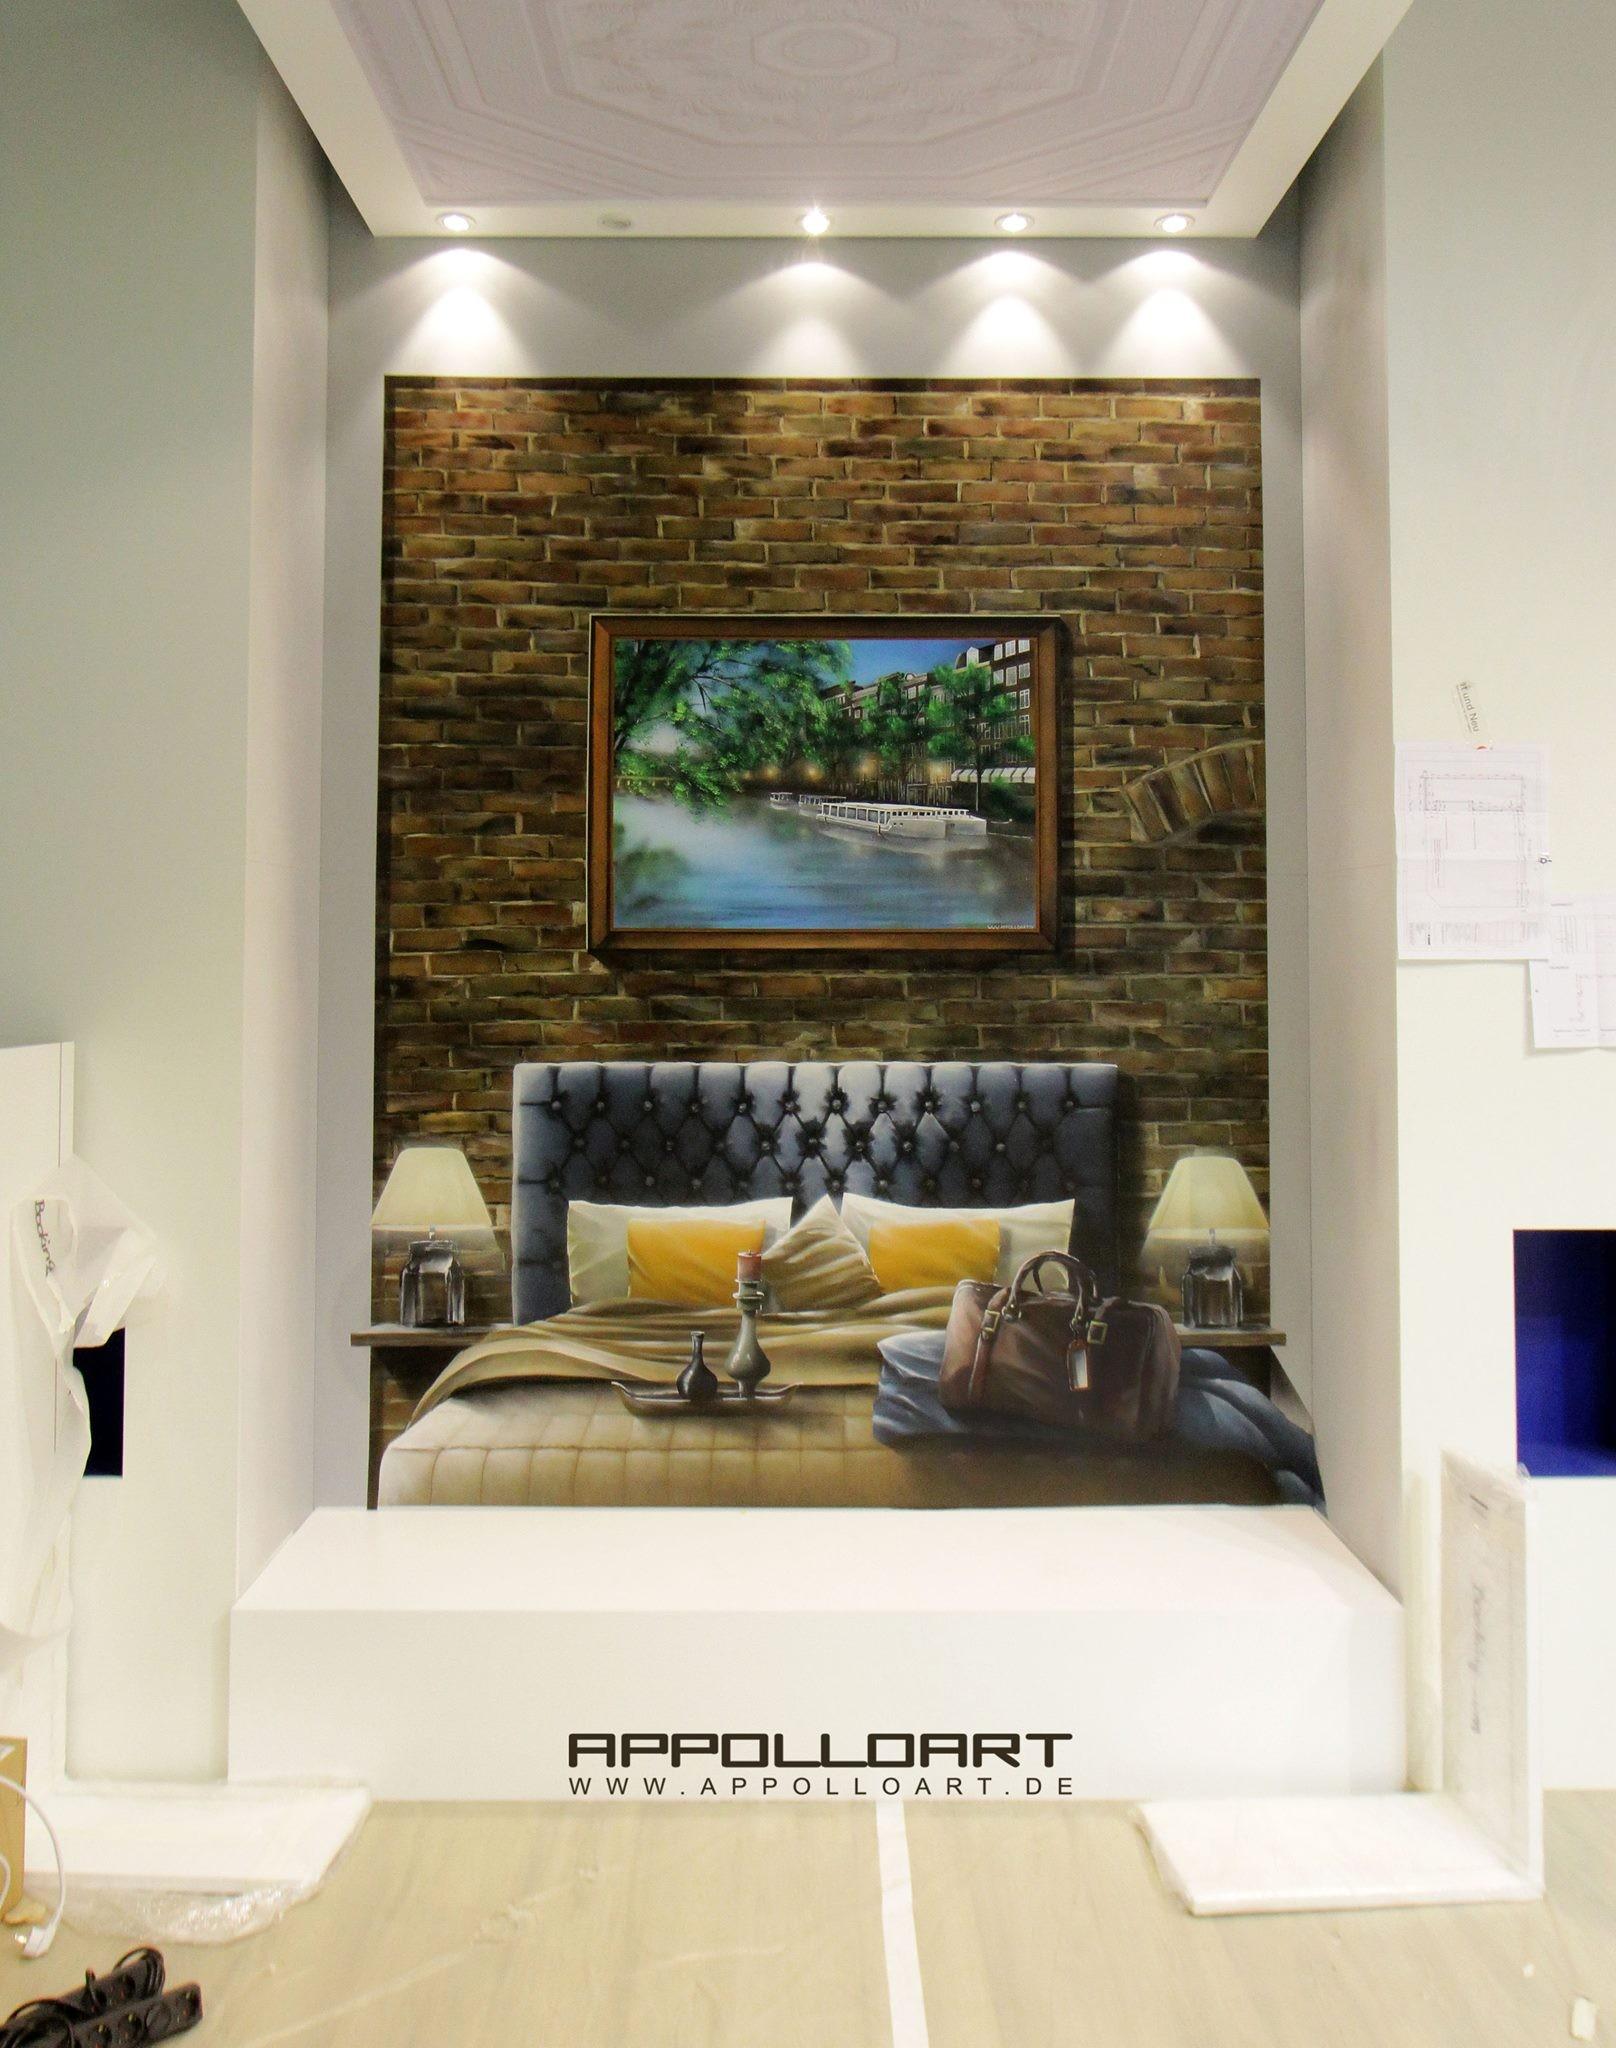 illusion schlafzimmer appolloart graffiti airbrush wandgestaltung fassadengestaltung in 3d. Black Bedroom Furniture Sets. Home Design Ideas